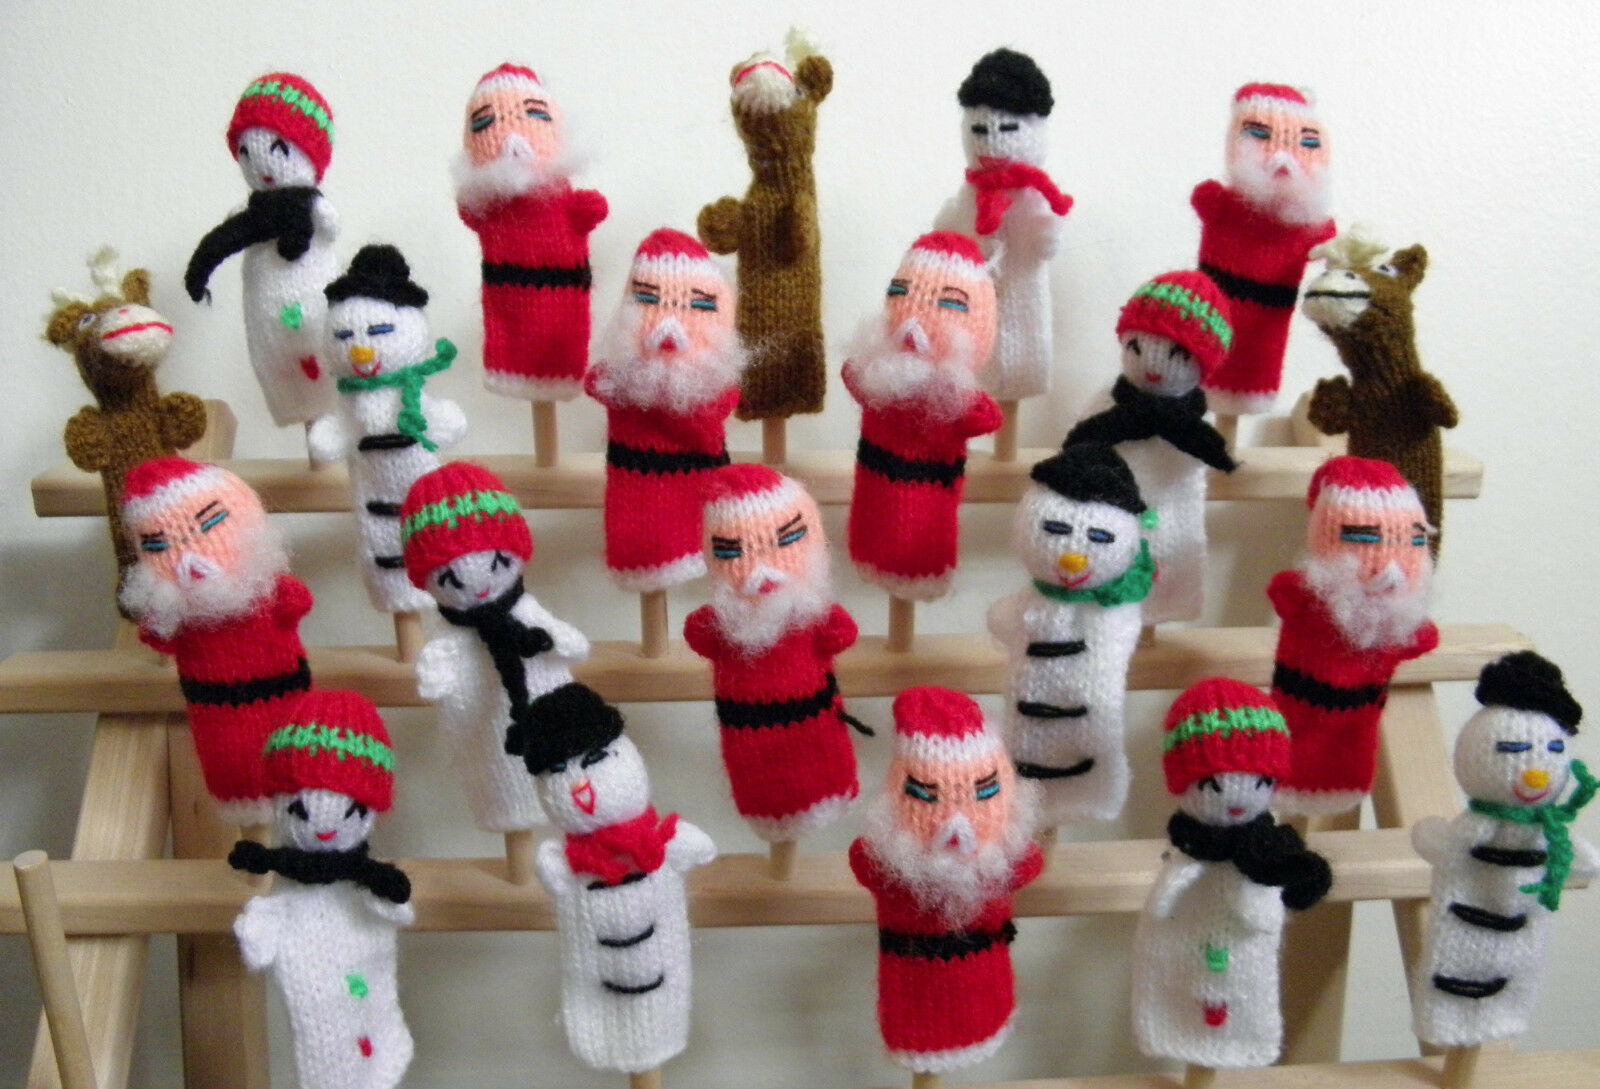 100 New From Peru Knitted Finger Puppets Christmas Santa, Snowman, Reindeer